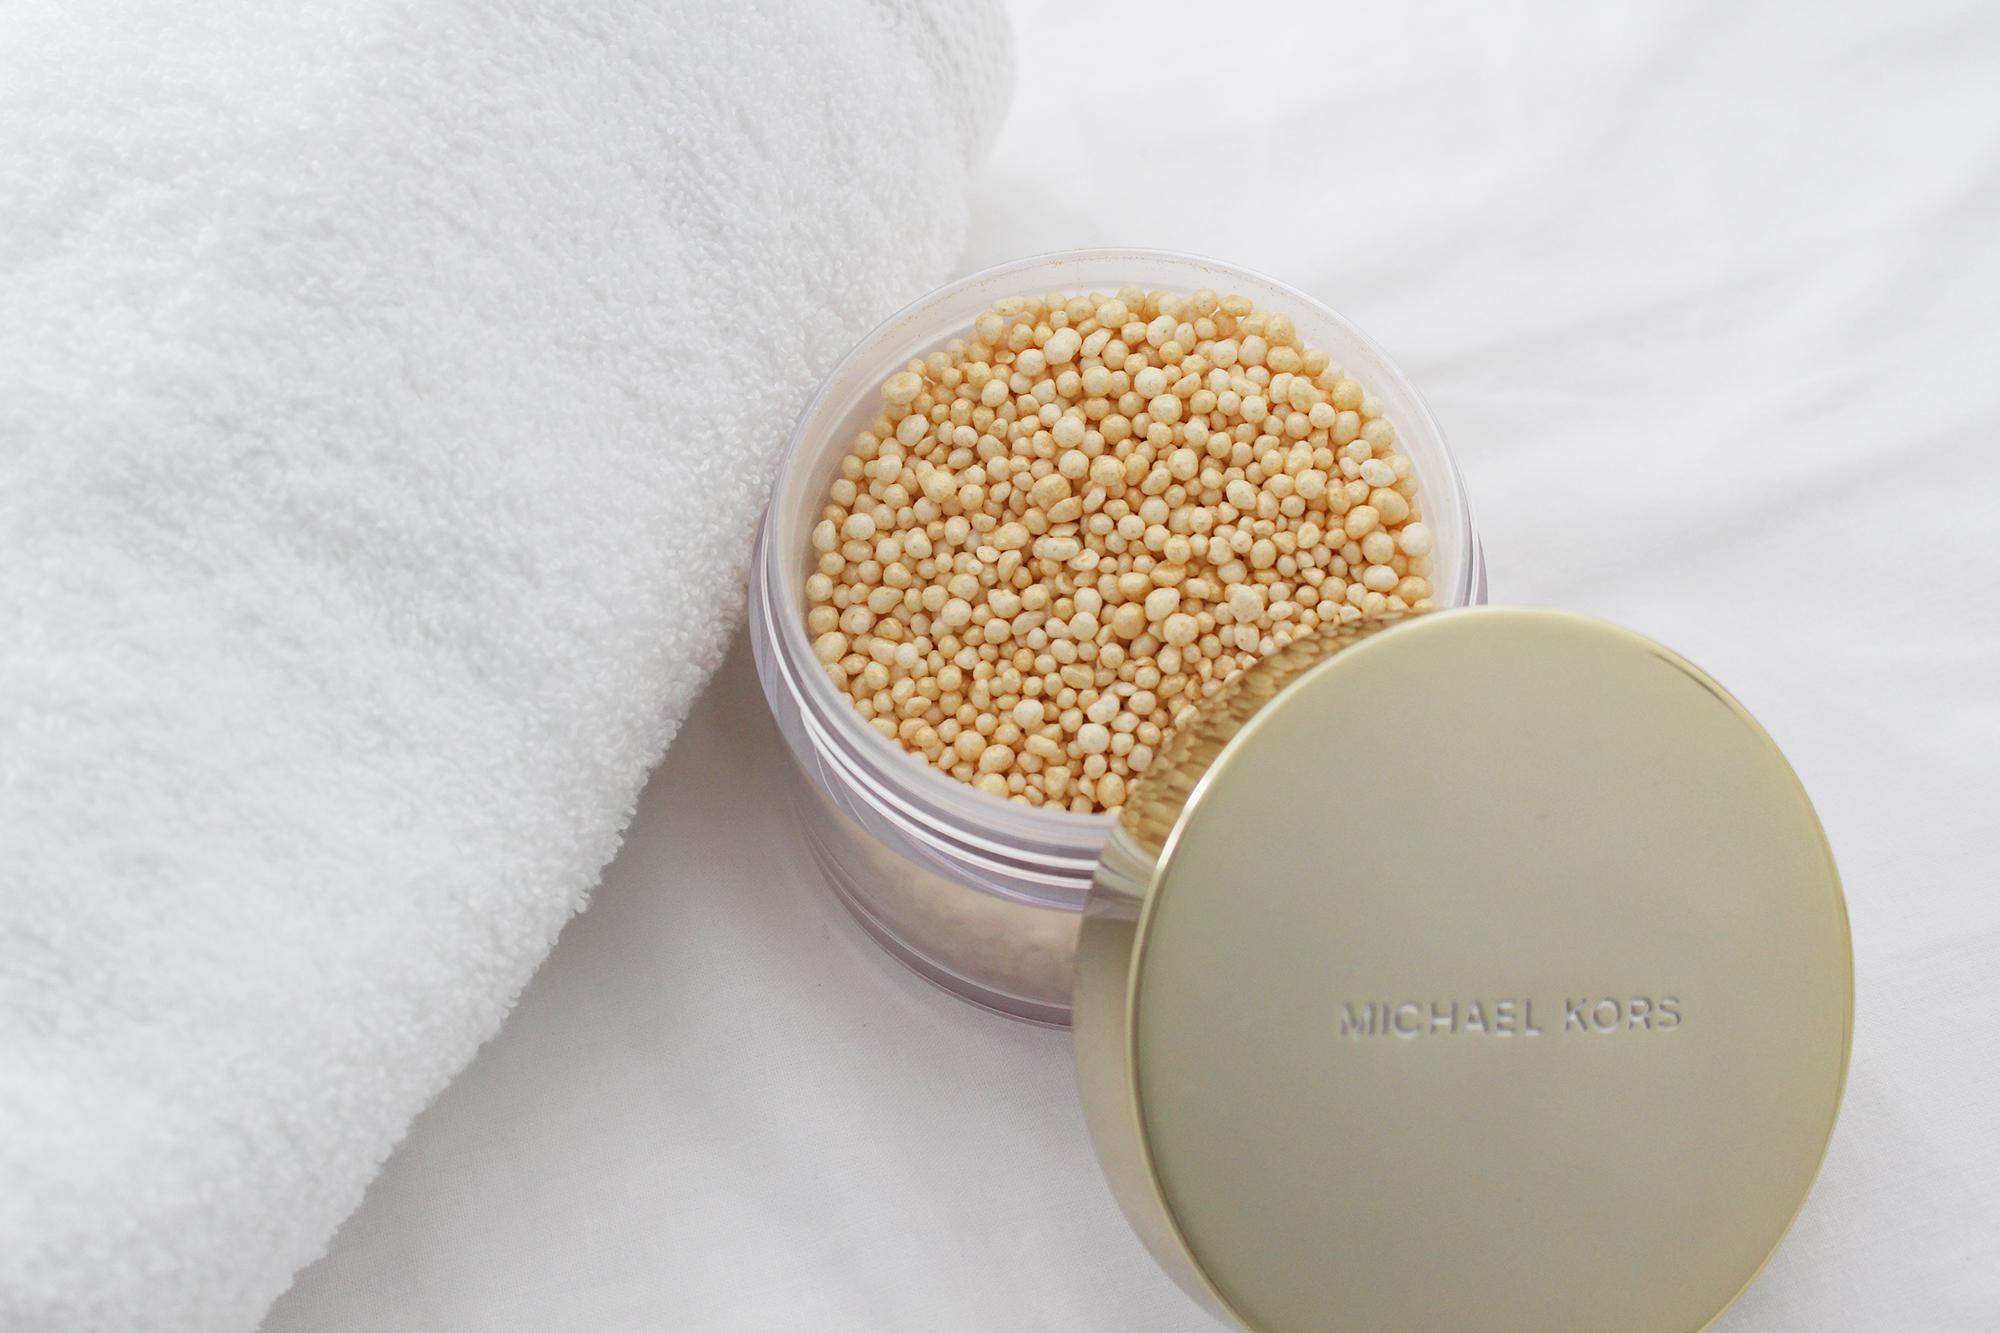 michael-kors-luster-bath-beads